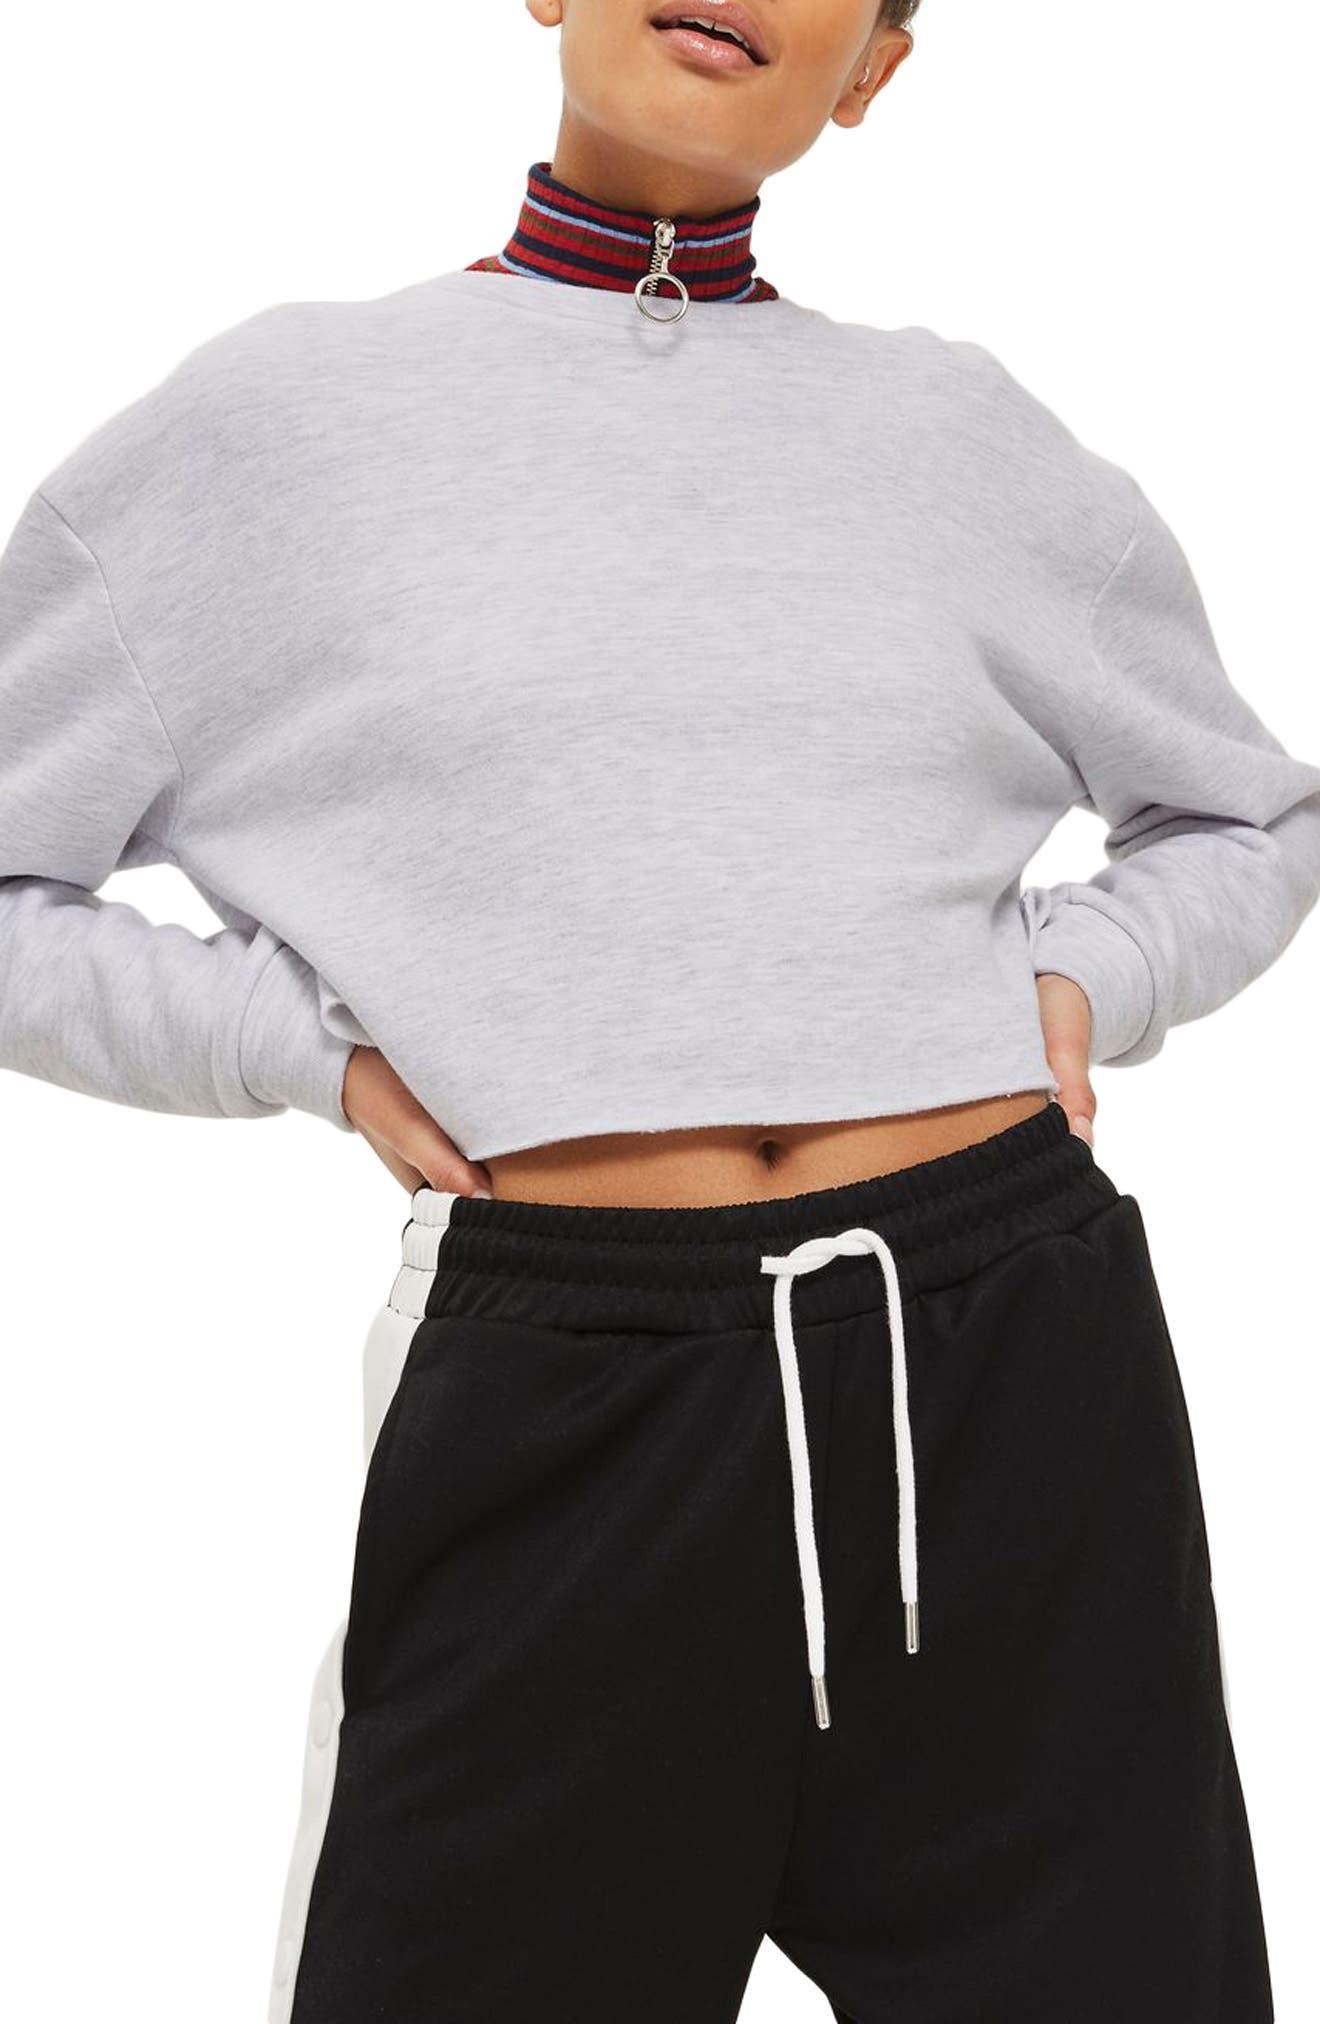 Crop Sweatshirt,                             Main thumbnail 1, color,                             GREY MARL